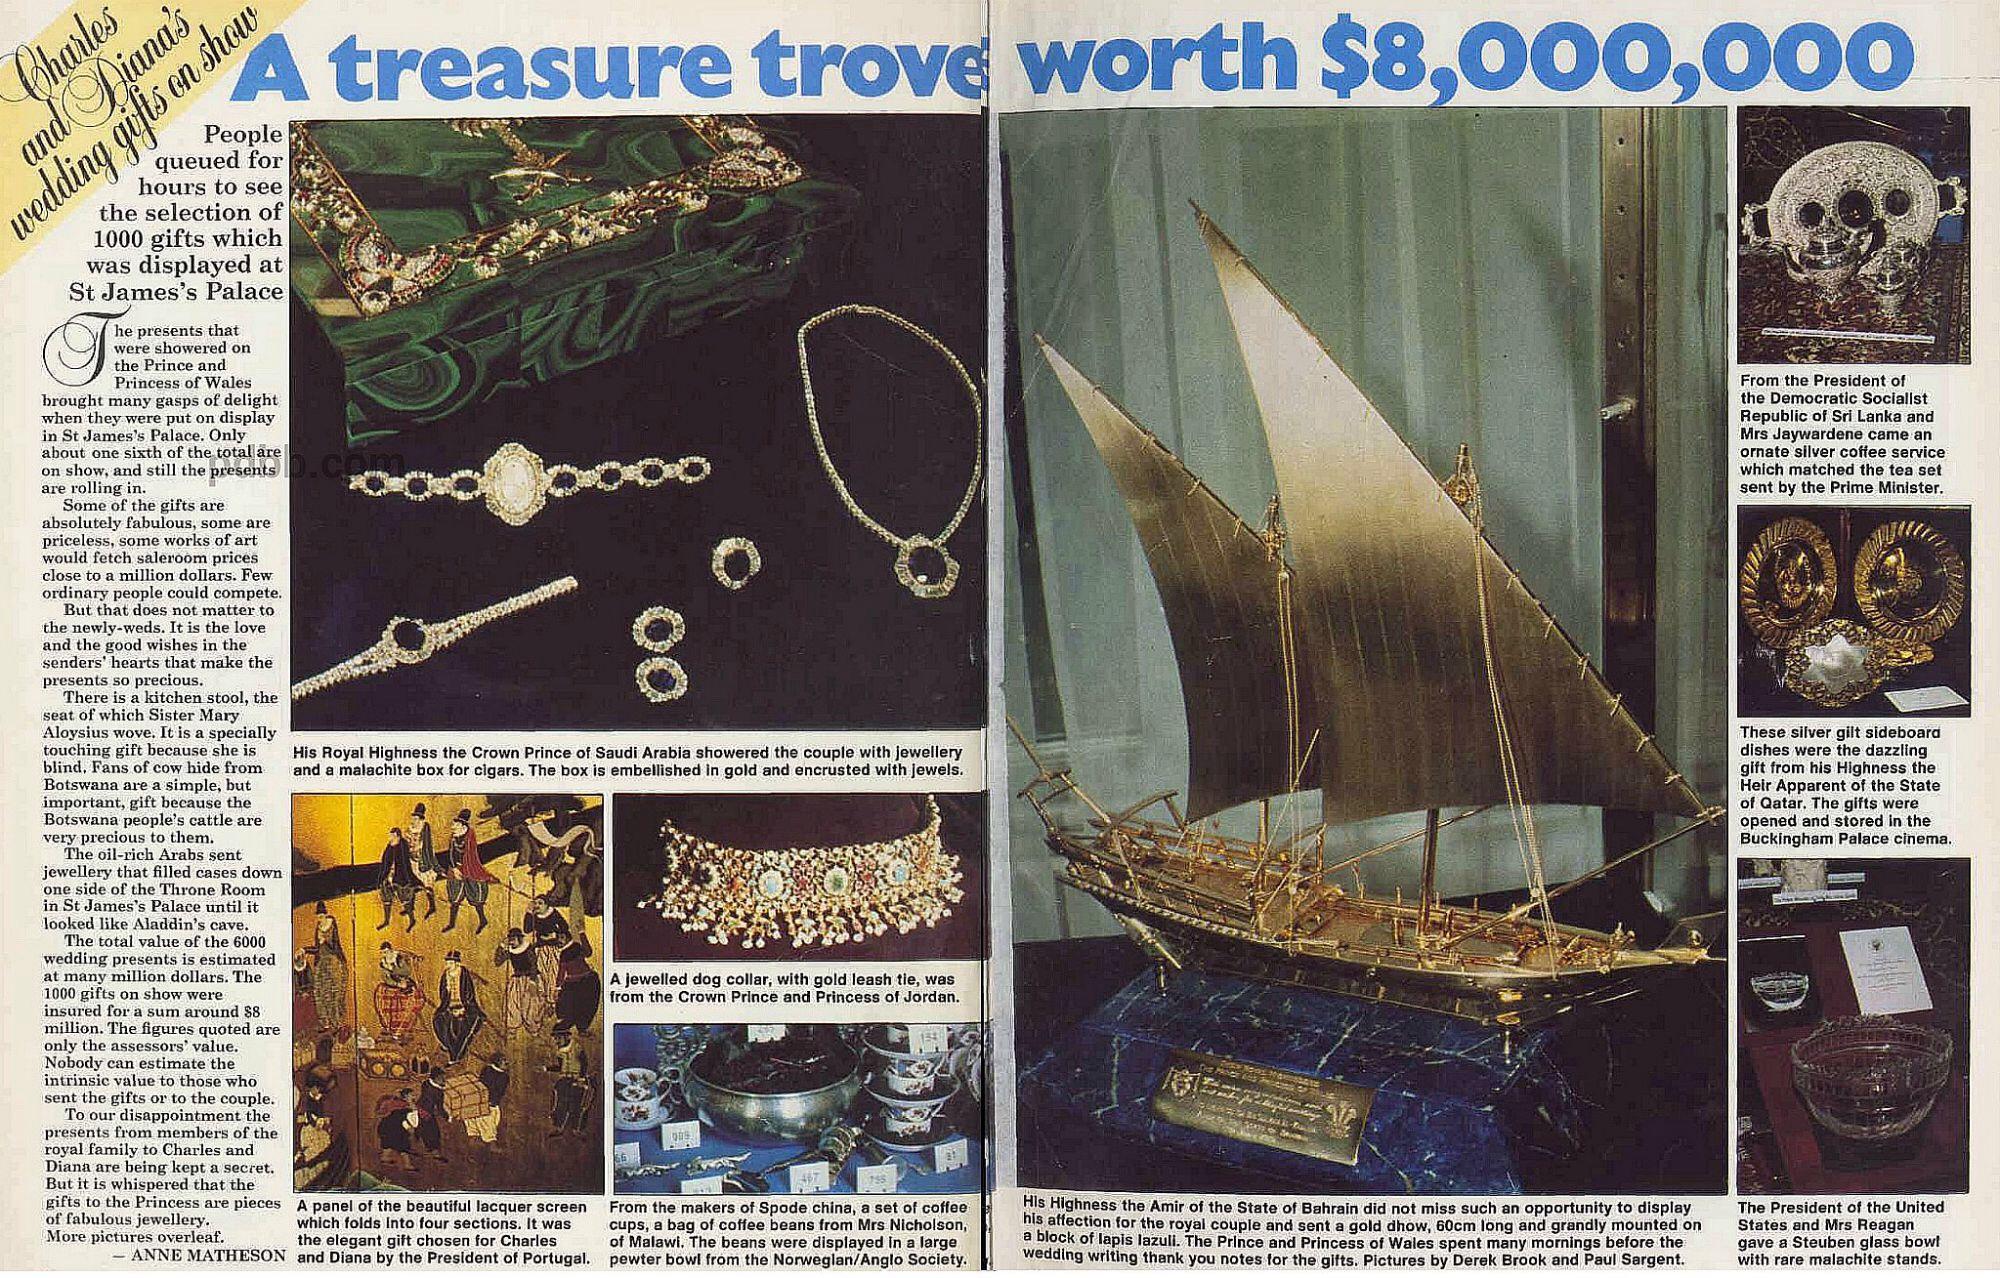 Royal Wedding Gifts: OUR SPECIAL PRINCESS DIANA NEWS BLOG ARTICLE: TREASURE